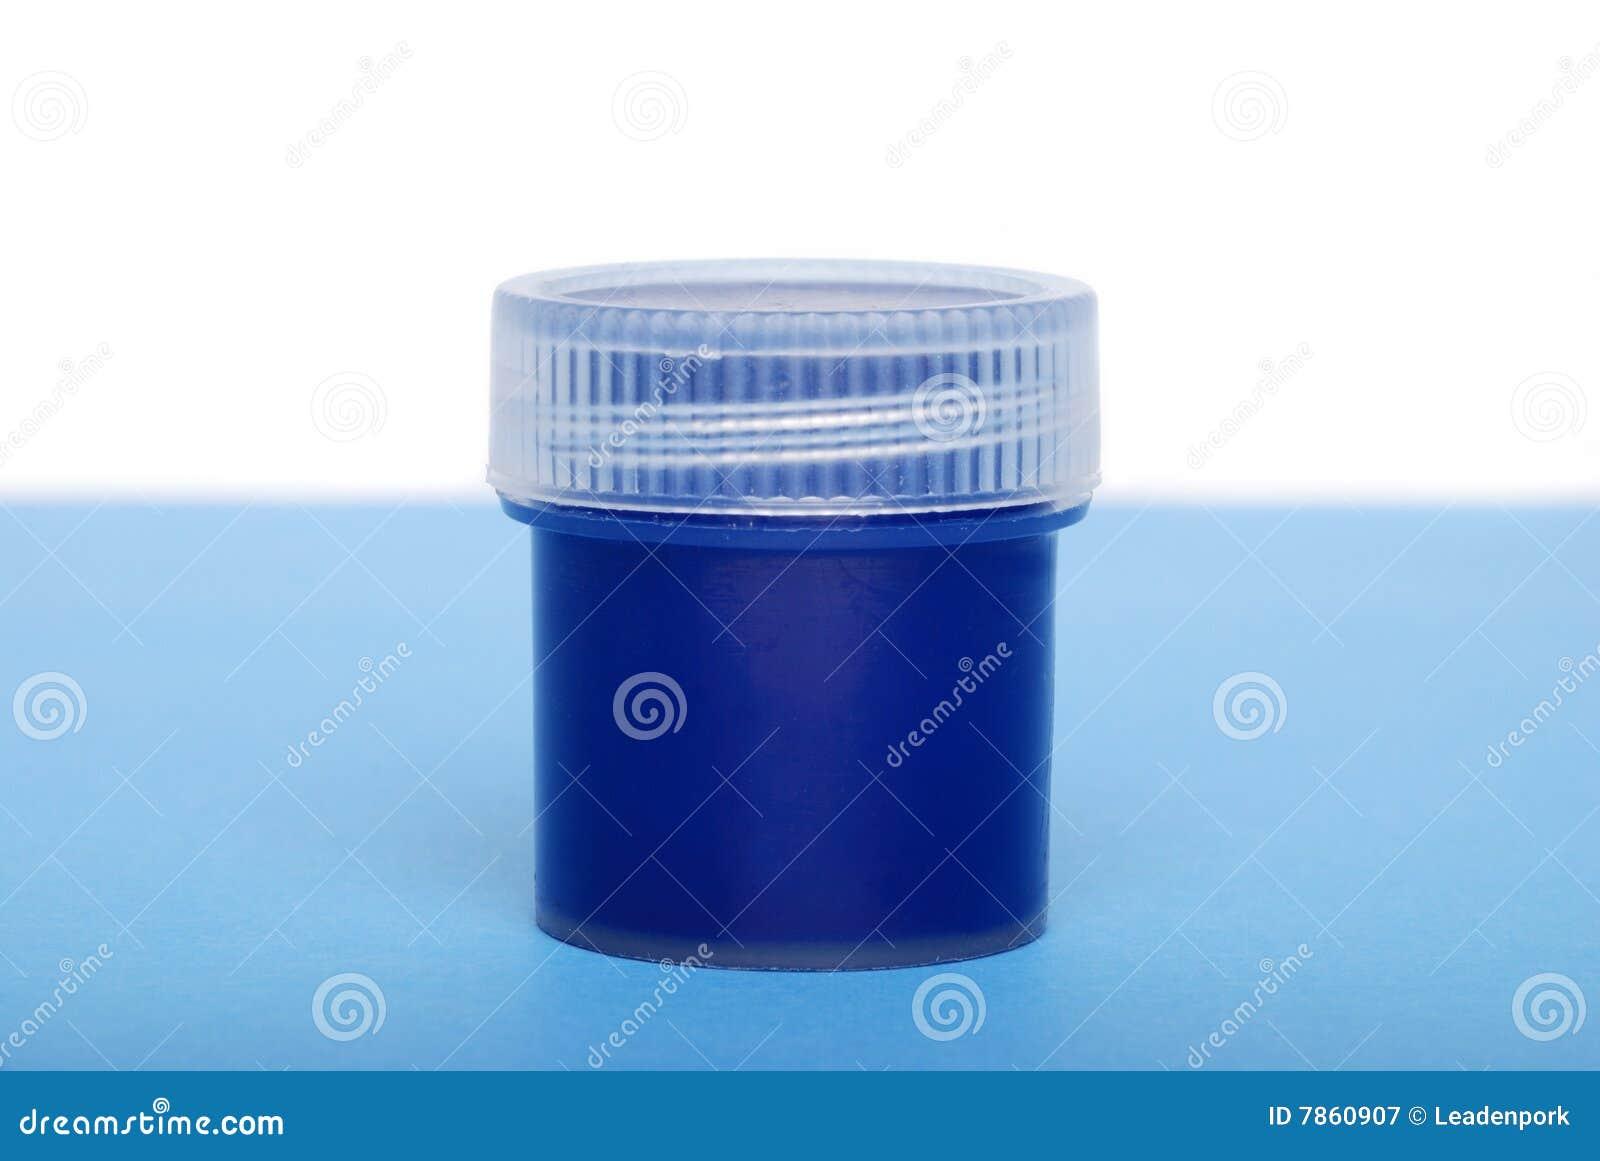 Blauwe verf royalty vrije stock fotografie afbeelding - Kleur blauwe verf ...